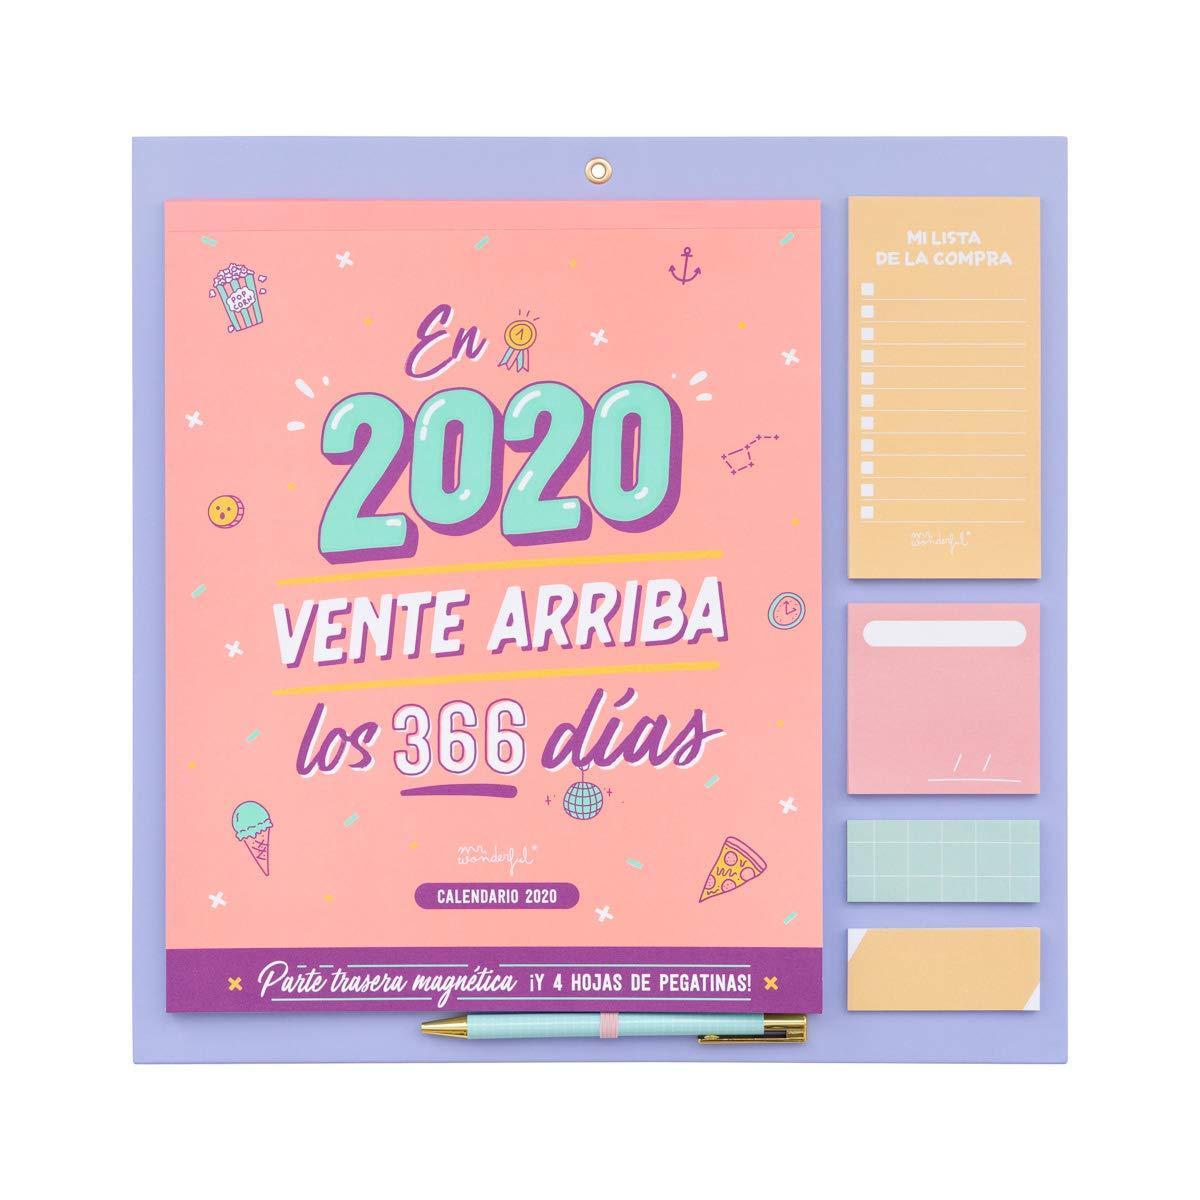 Amazon.com : Wall Calendar 2020 - In 2020, Sent Up 366 Days ...